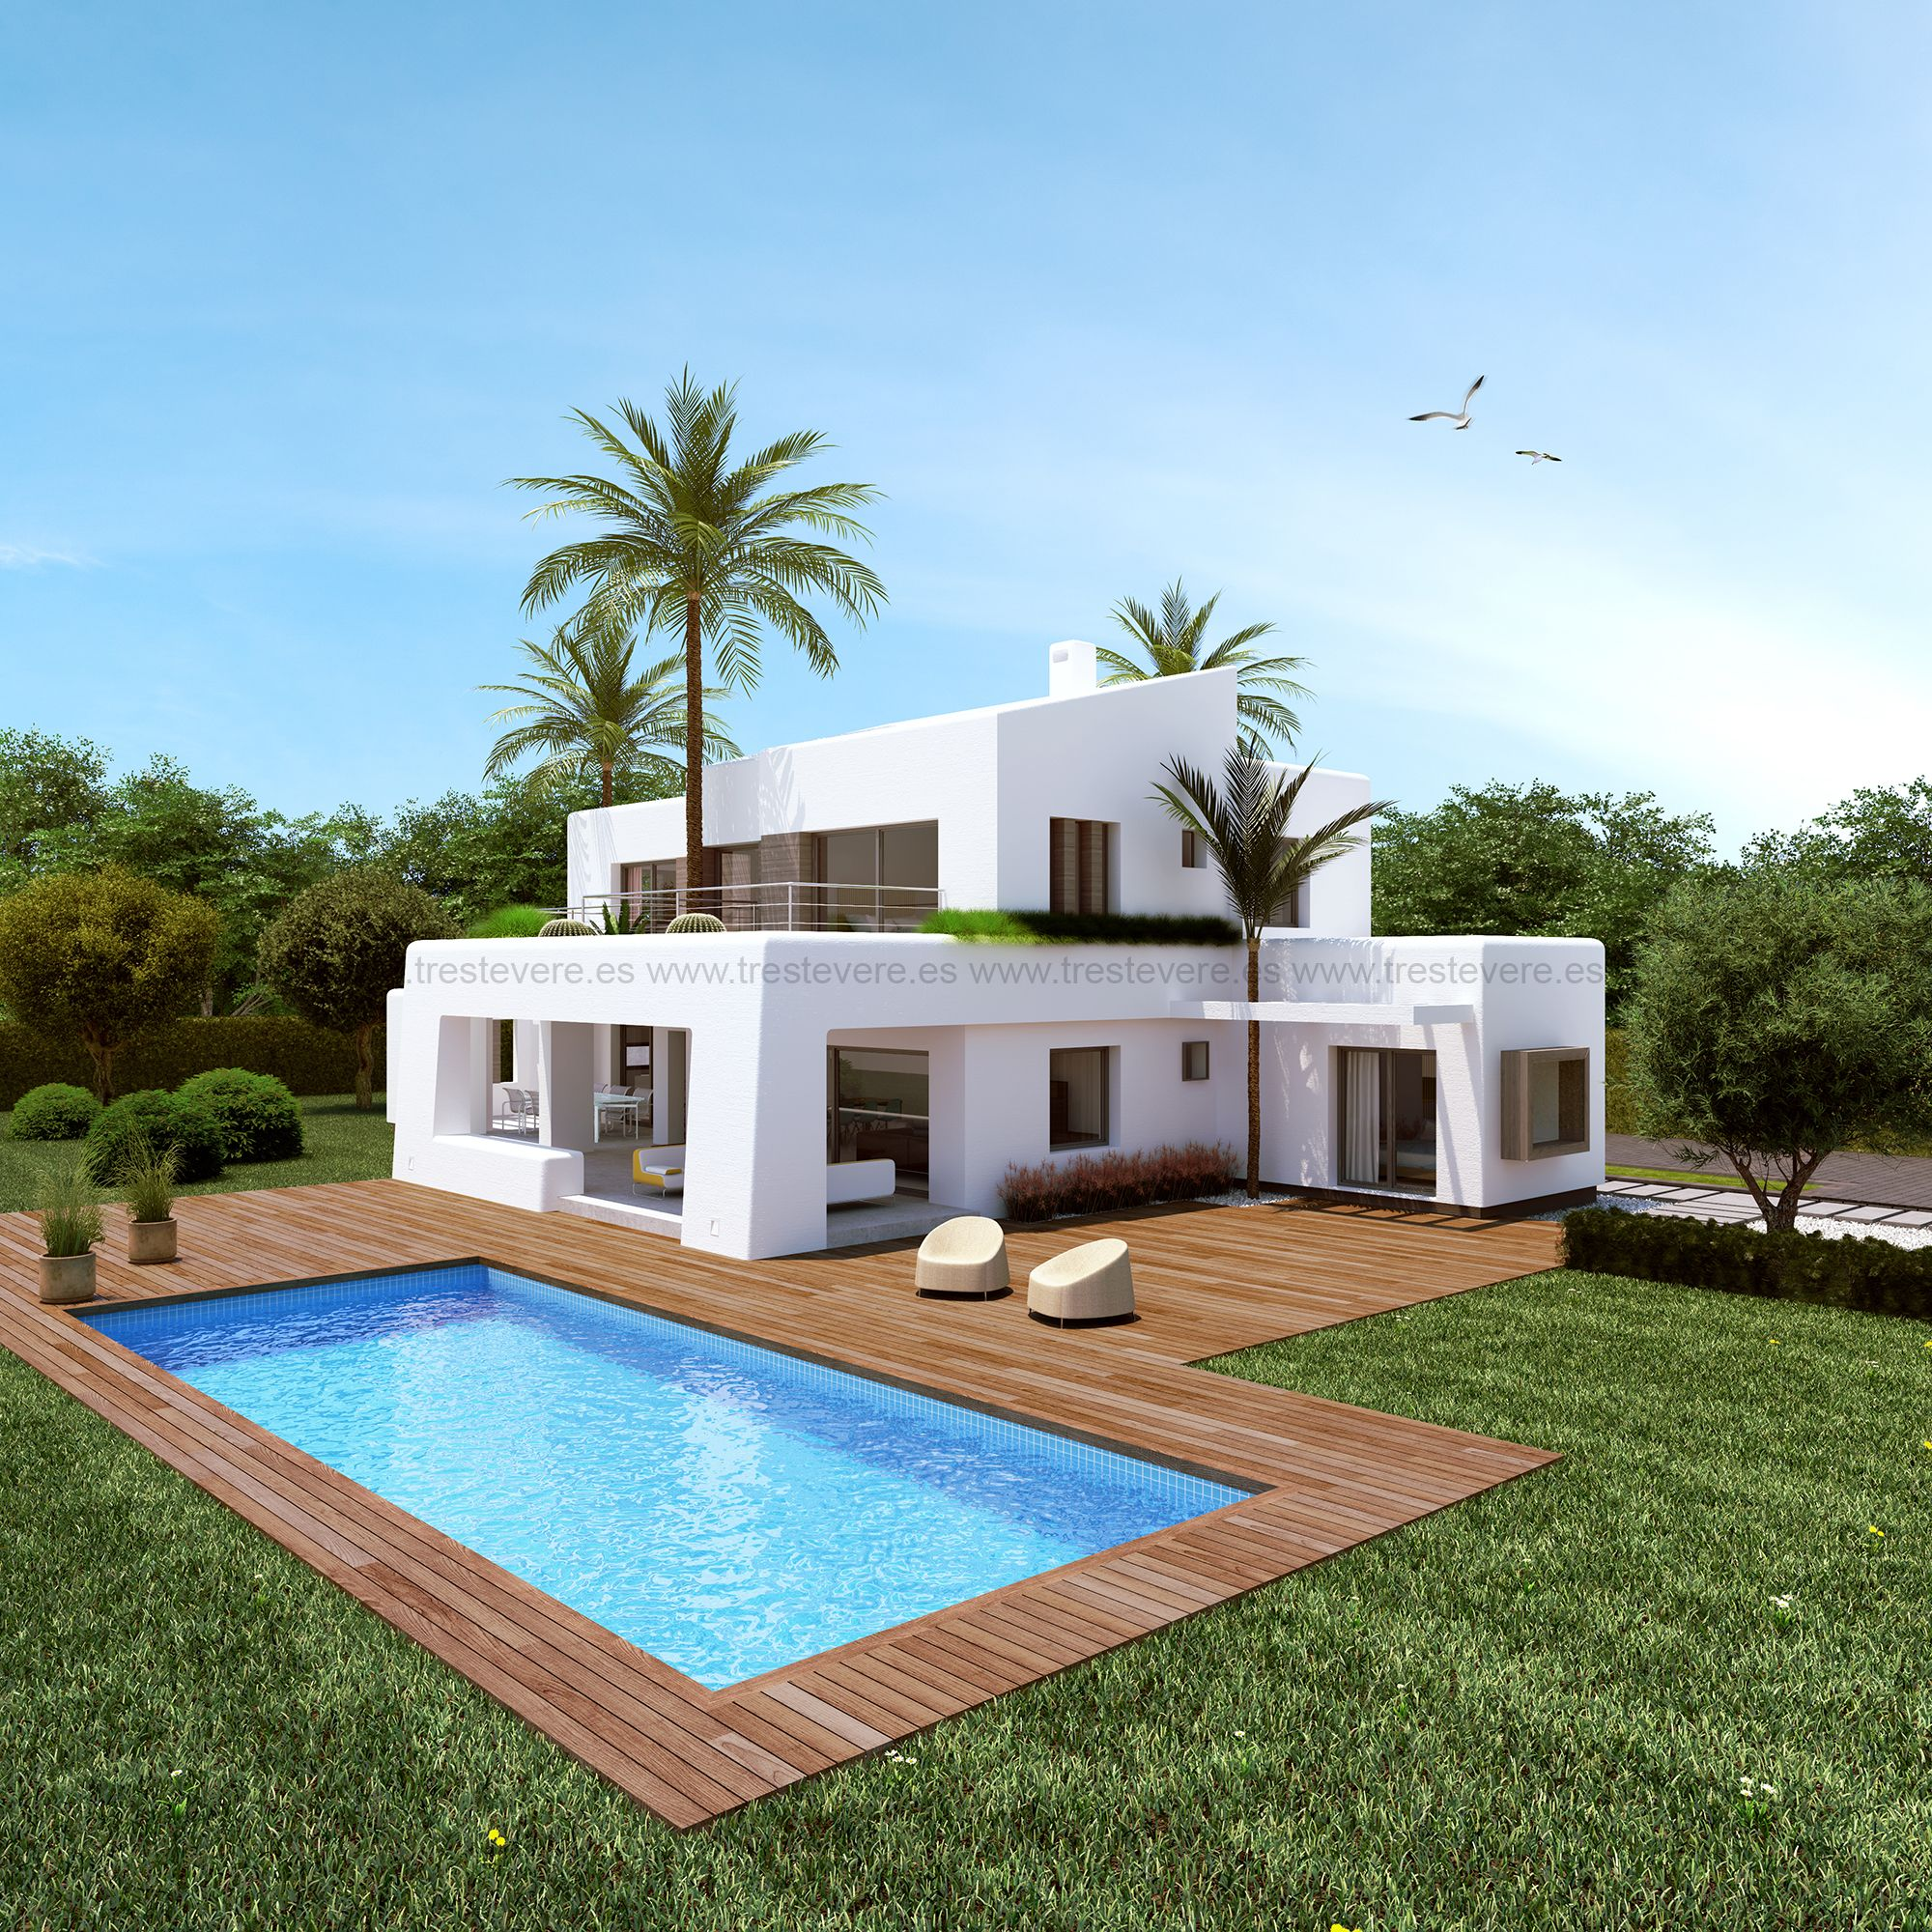 Resultat d'imatges de casa ibicenca | Casas con alberca ...